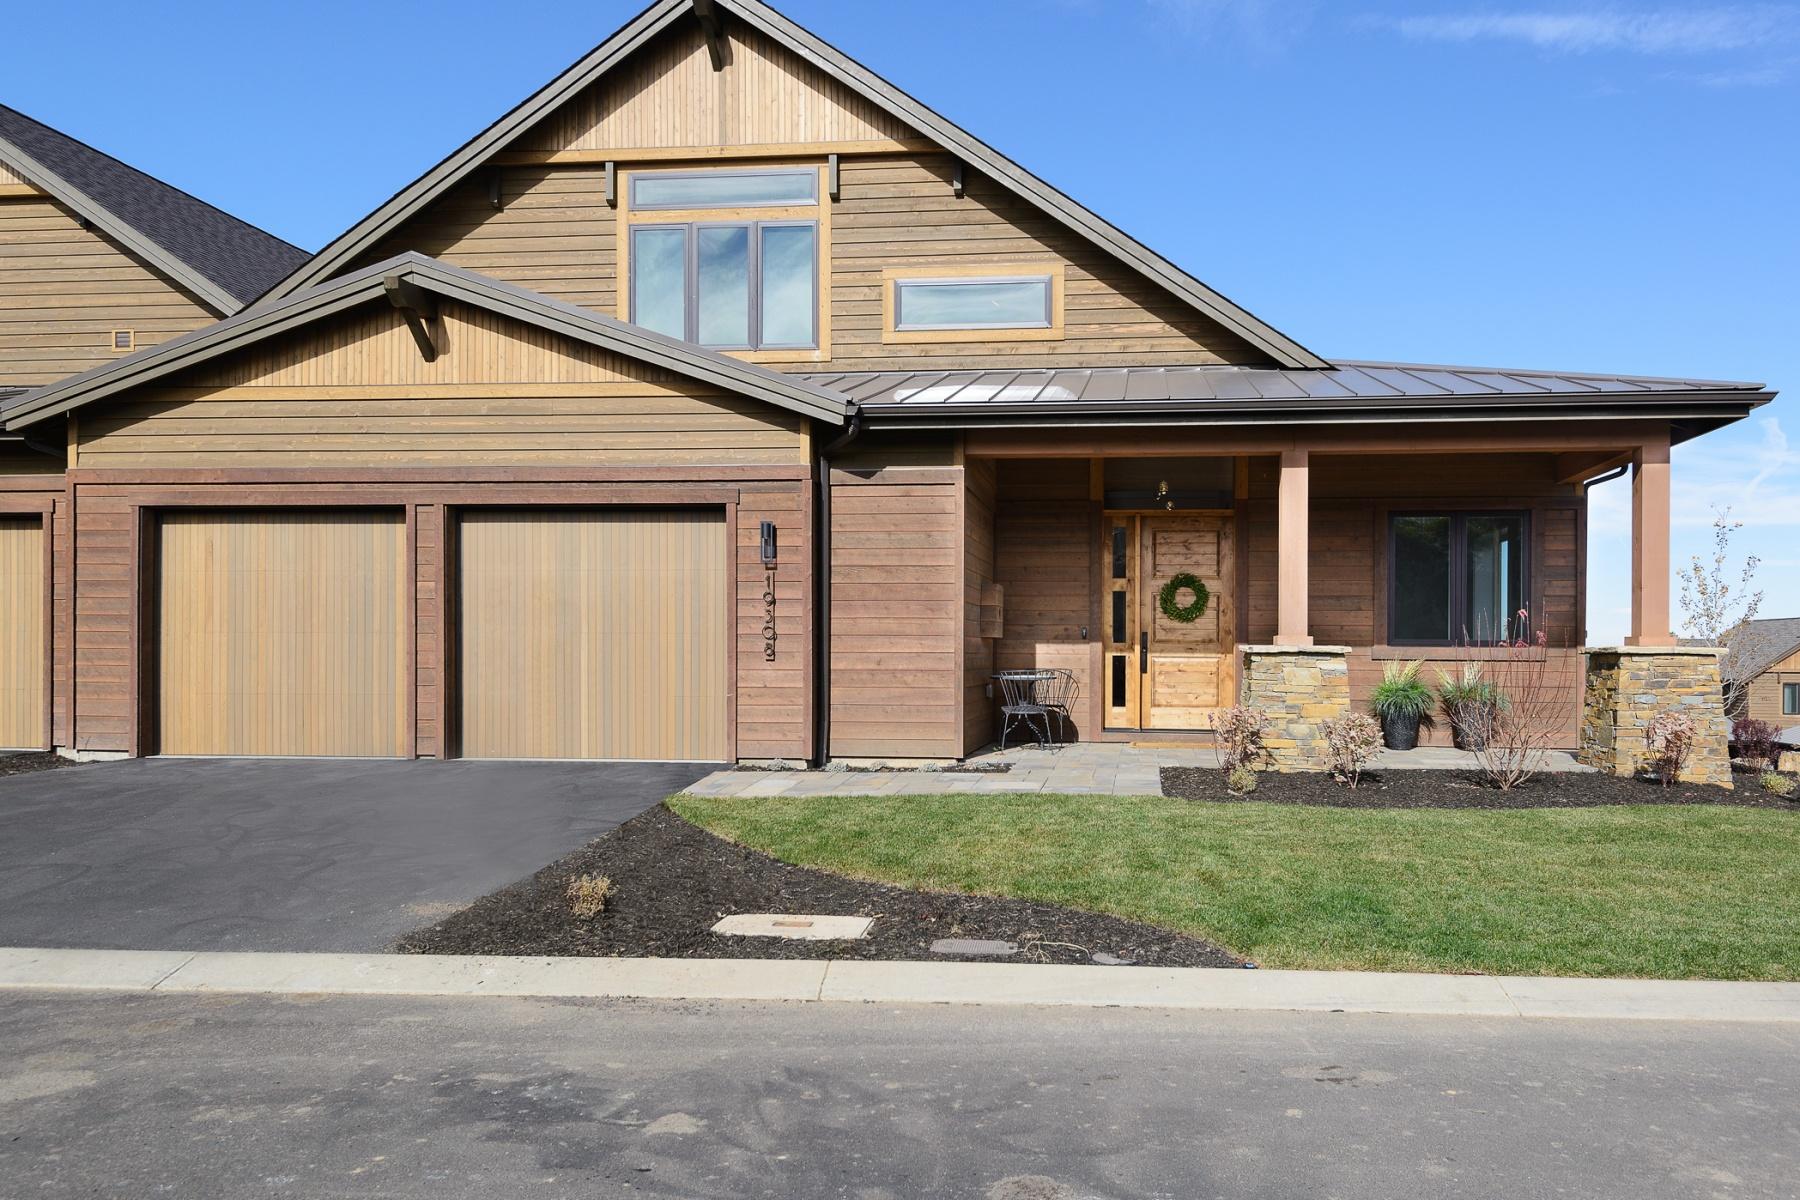 Townhouse for Sale at Award Winner at Tetherow! 19308 Eaton Lane, Bend, Oregon, 97702 United States